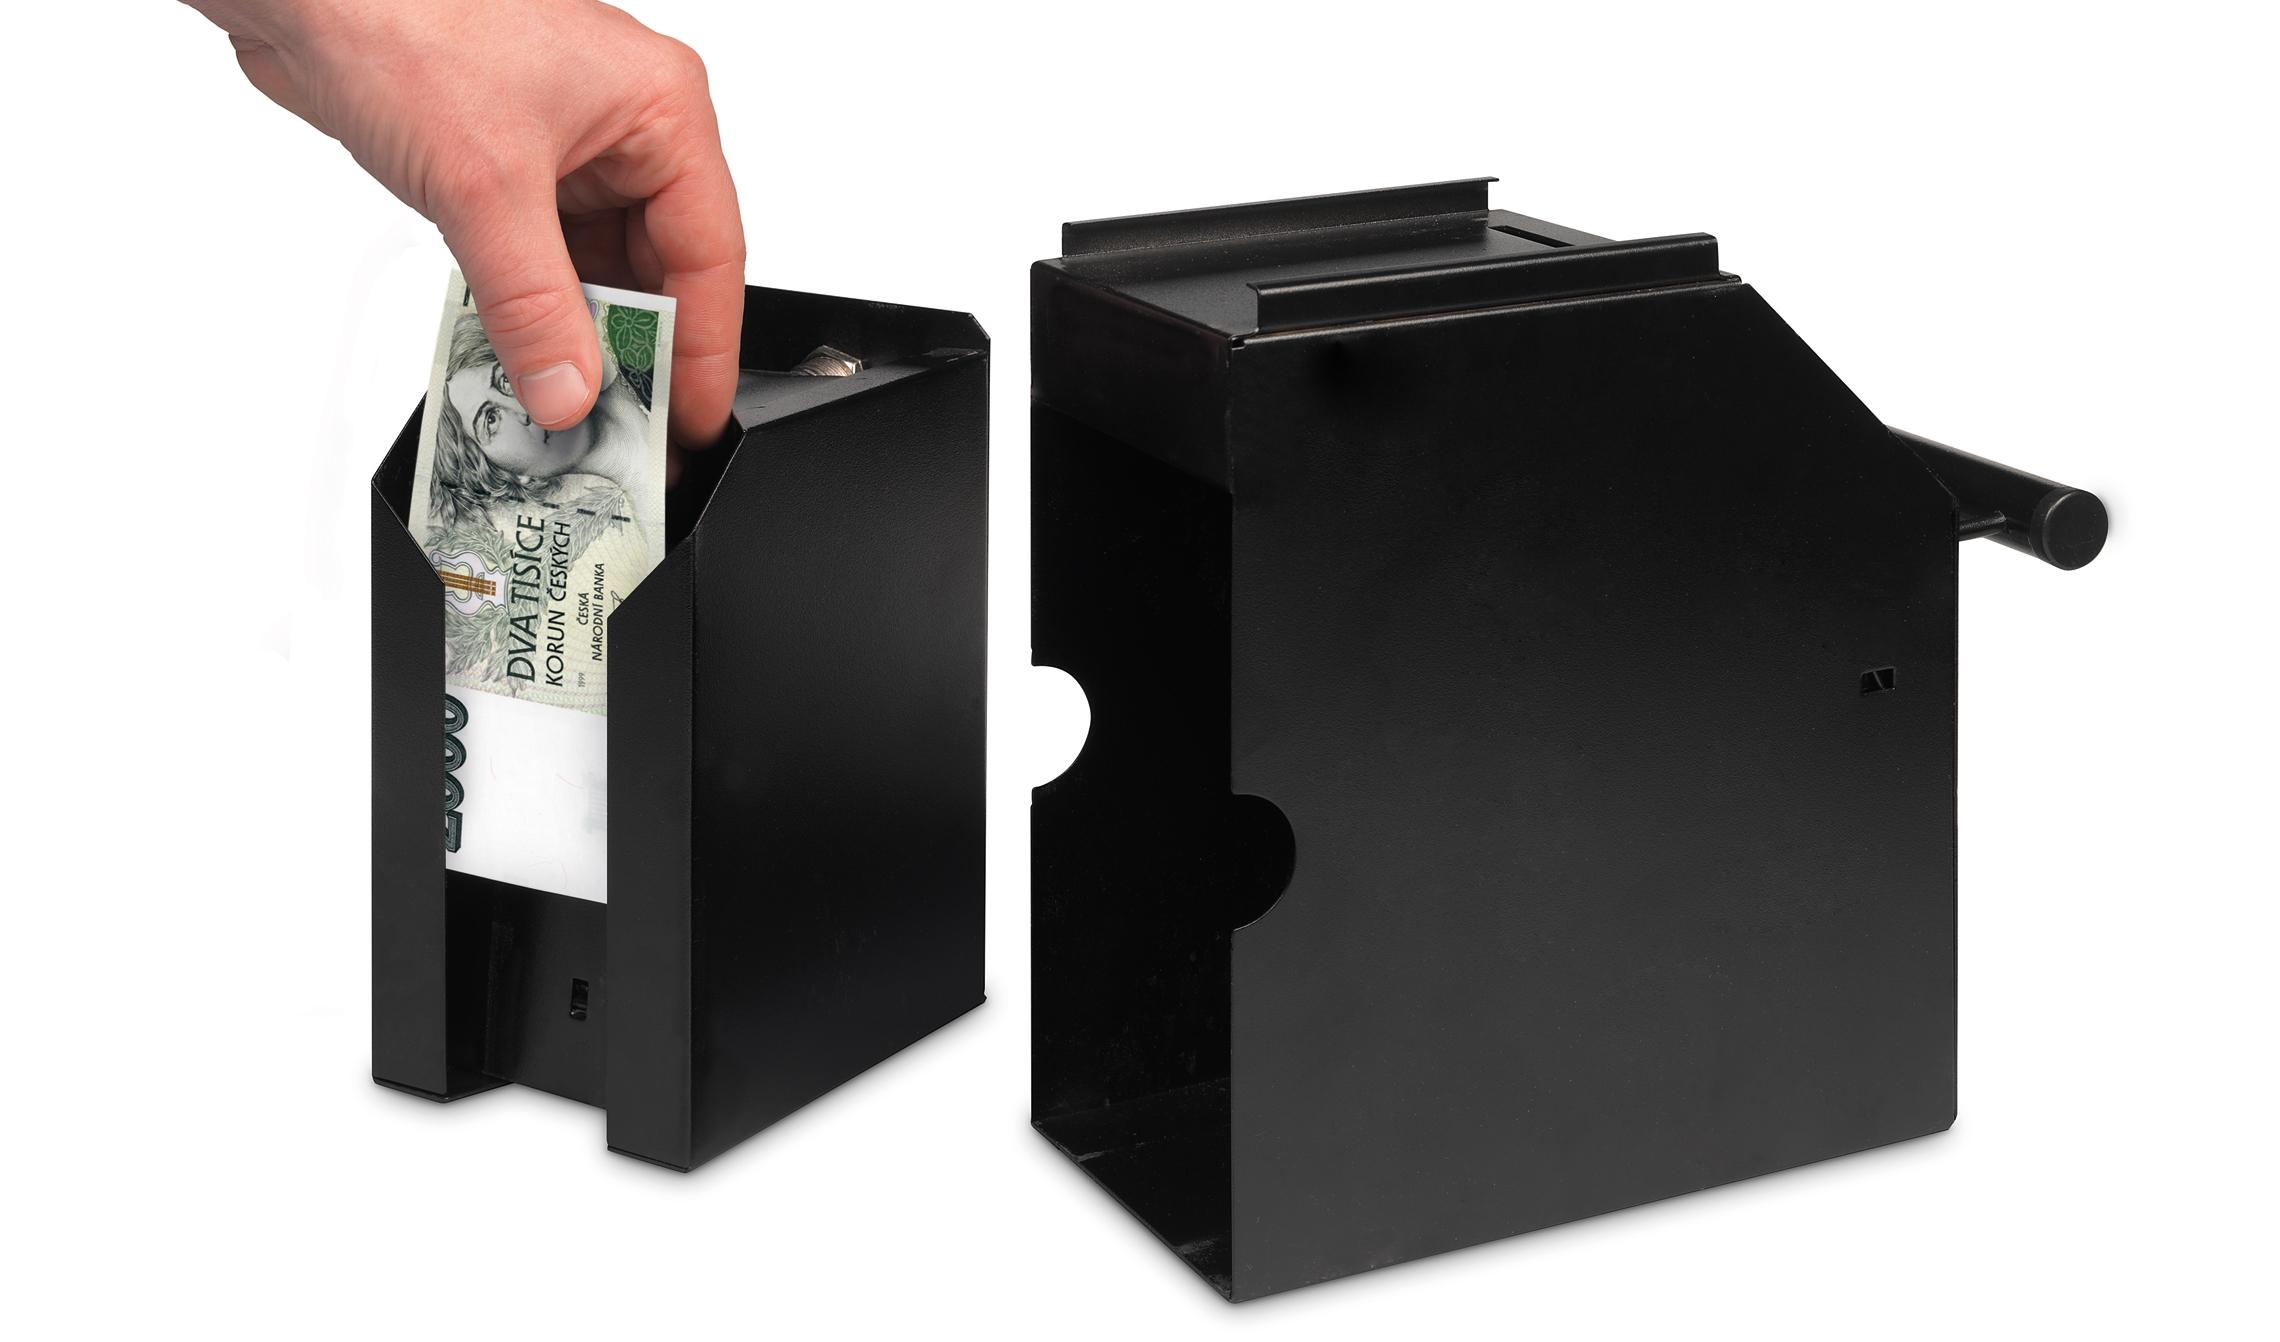 sejf-na-bankovky-safescan-4100b